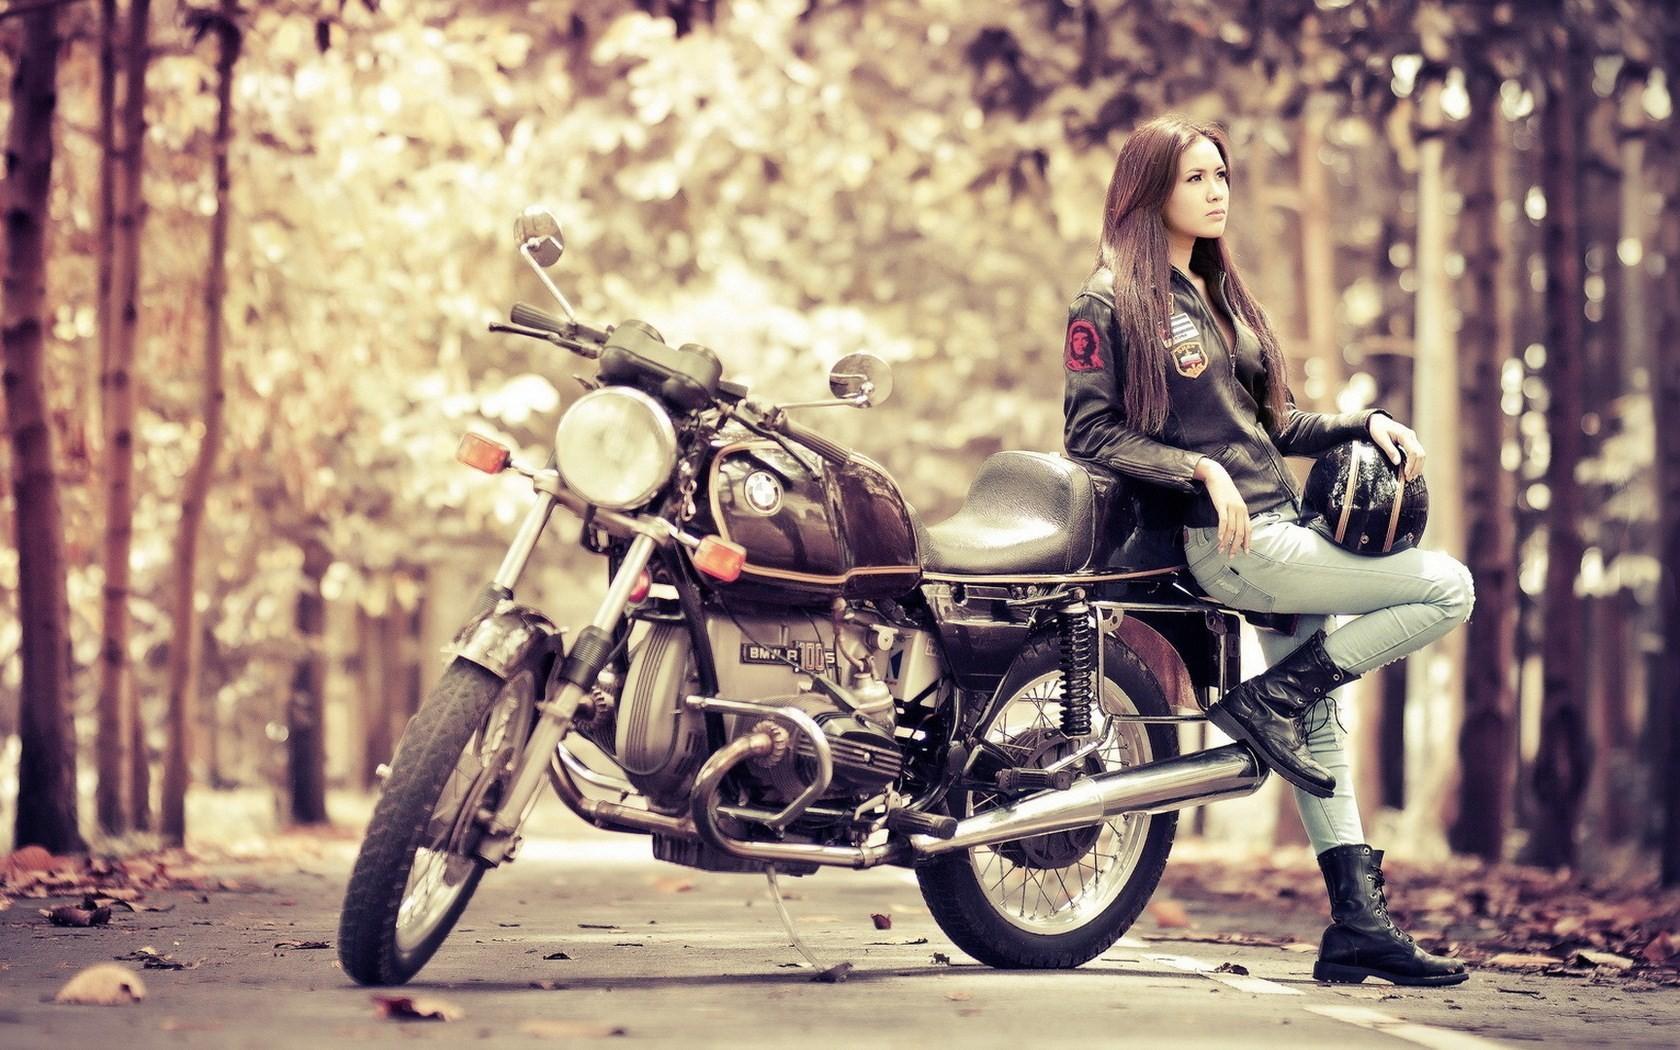 Hot girl riding bike 13